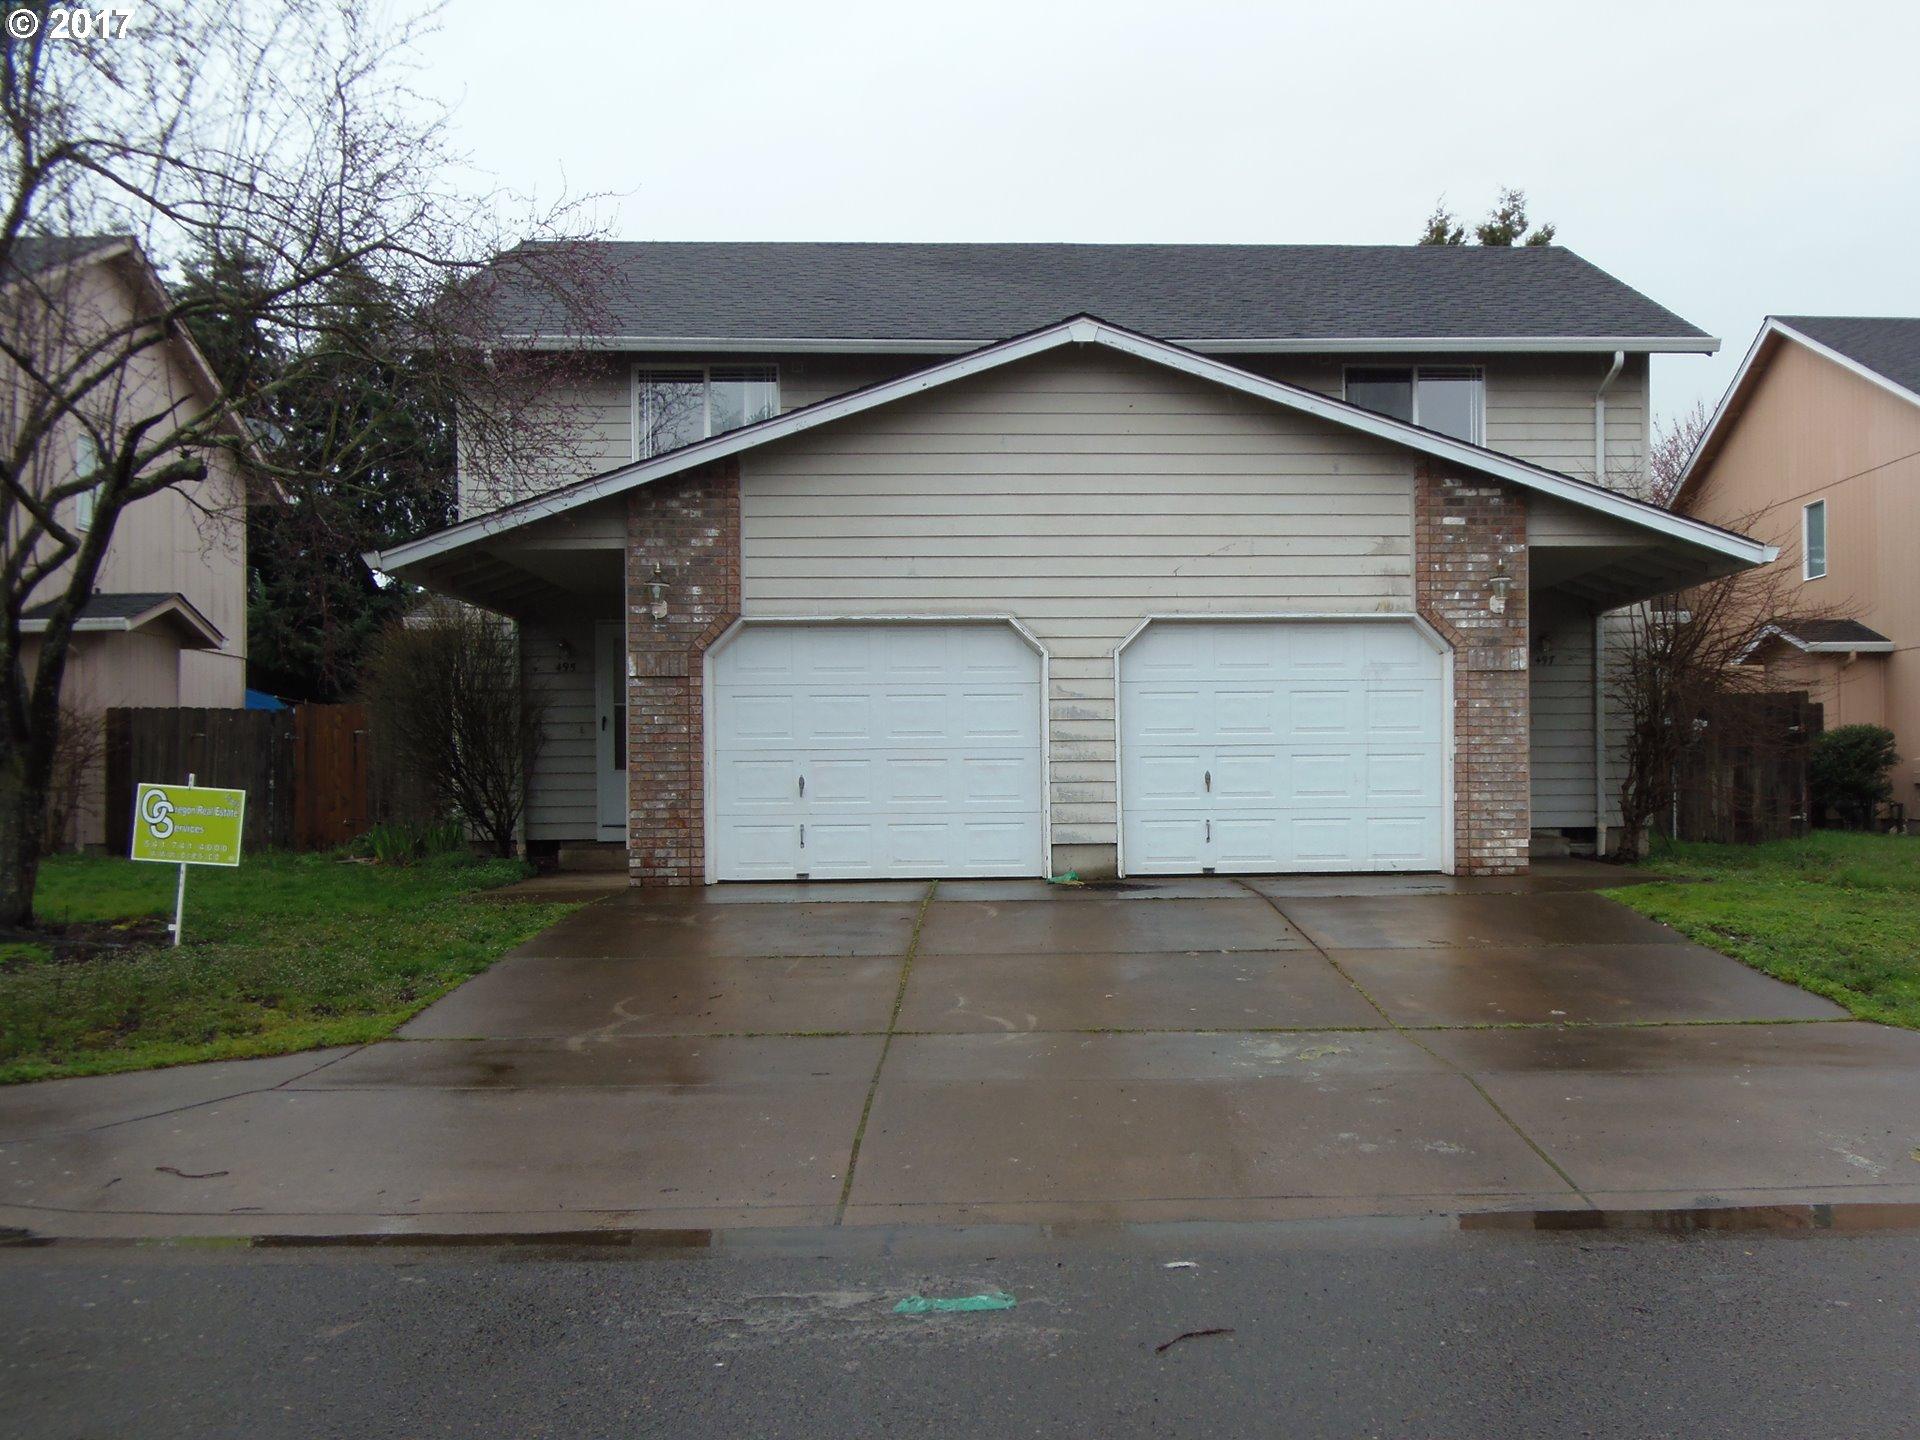 495 AUTUMN AVE, Eugene, OR 97404